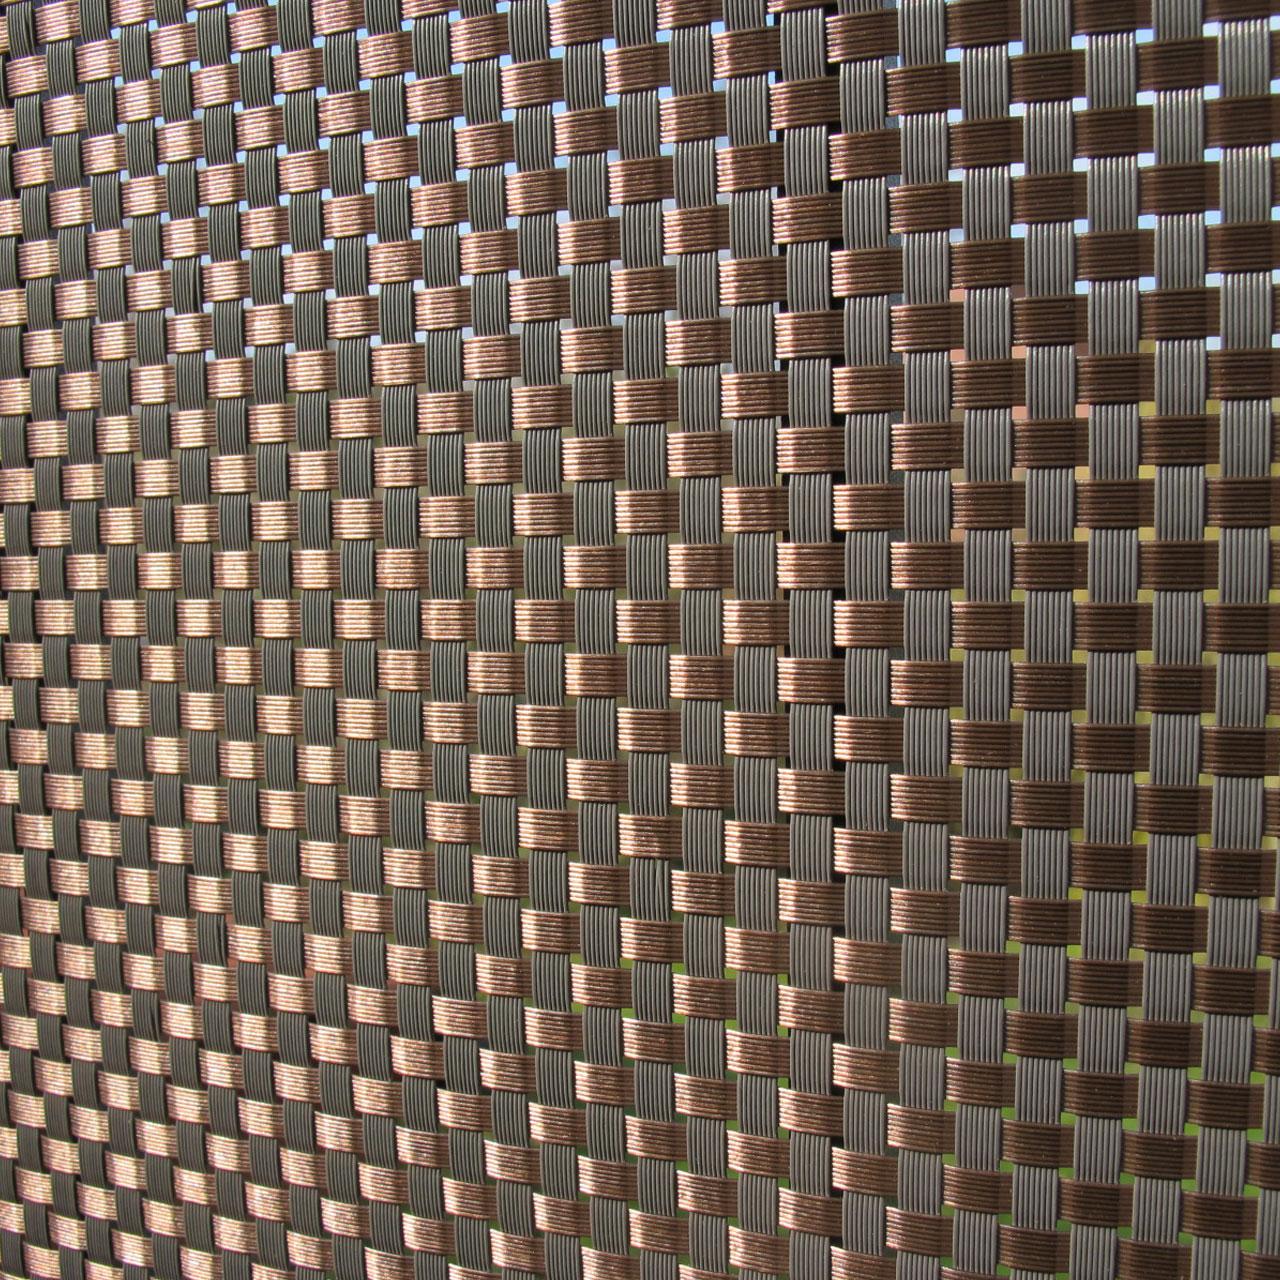 Balkonverkleidung Kunststoffgeflecht Meterware Mocca Anthrazit